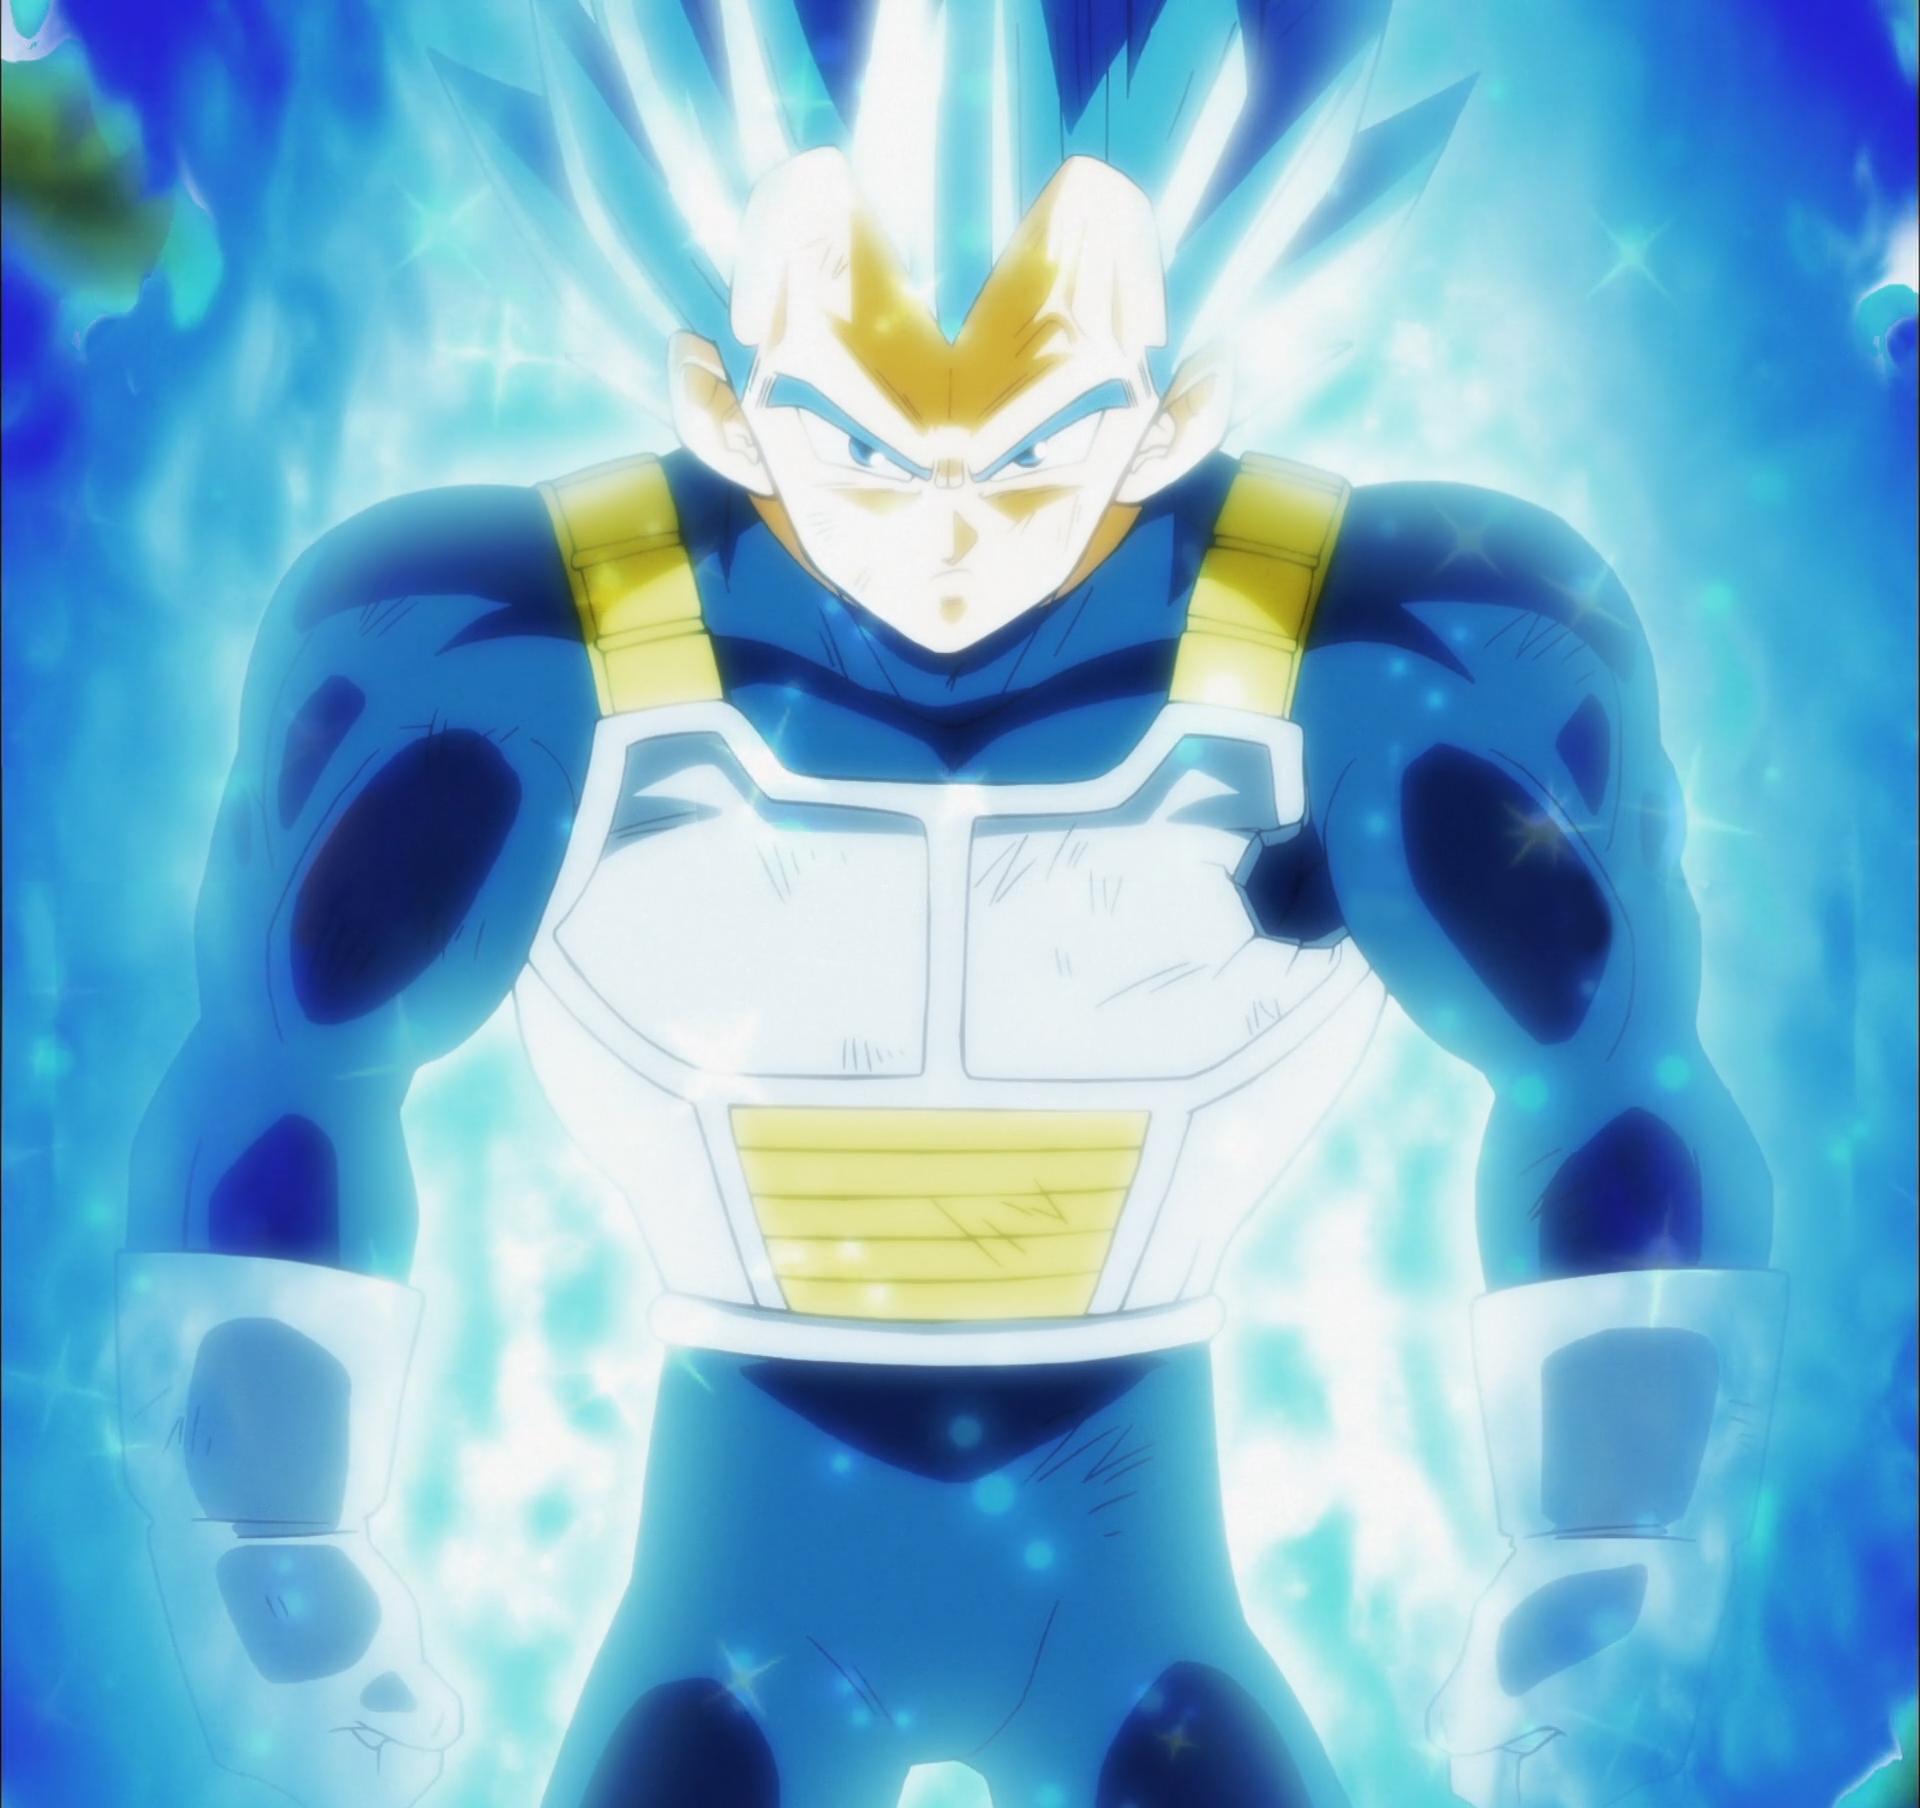 Super Saiyajin Deus Super Saiyajin: Evolução